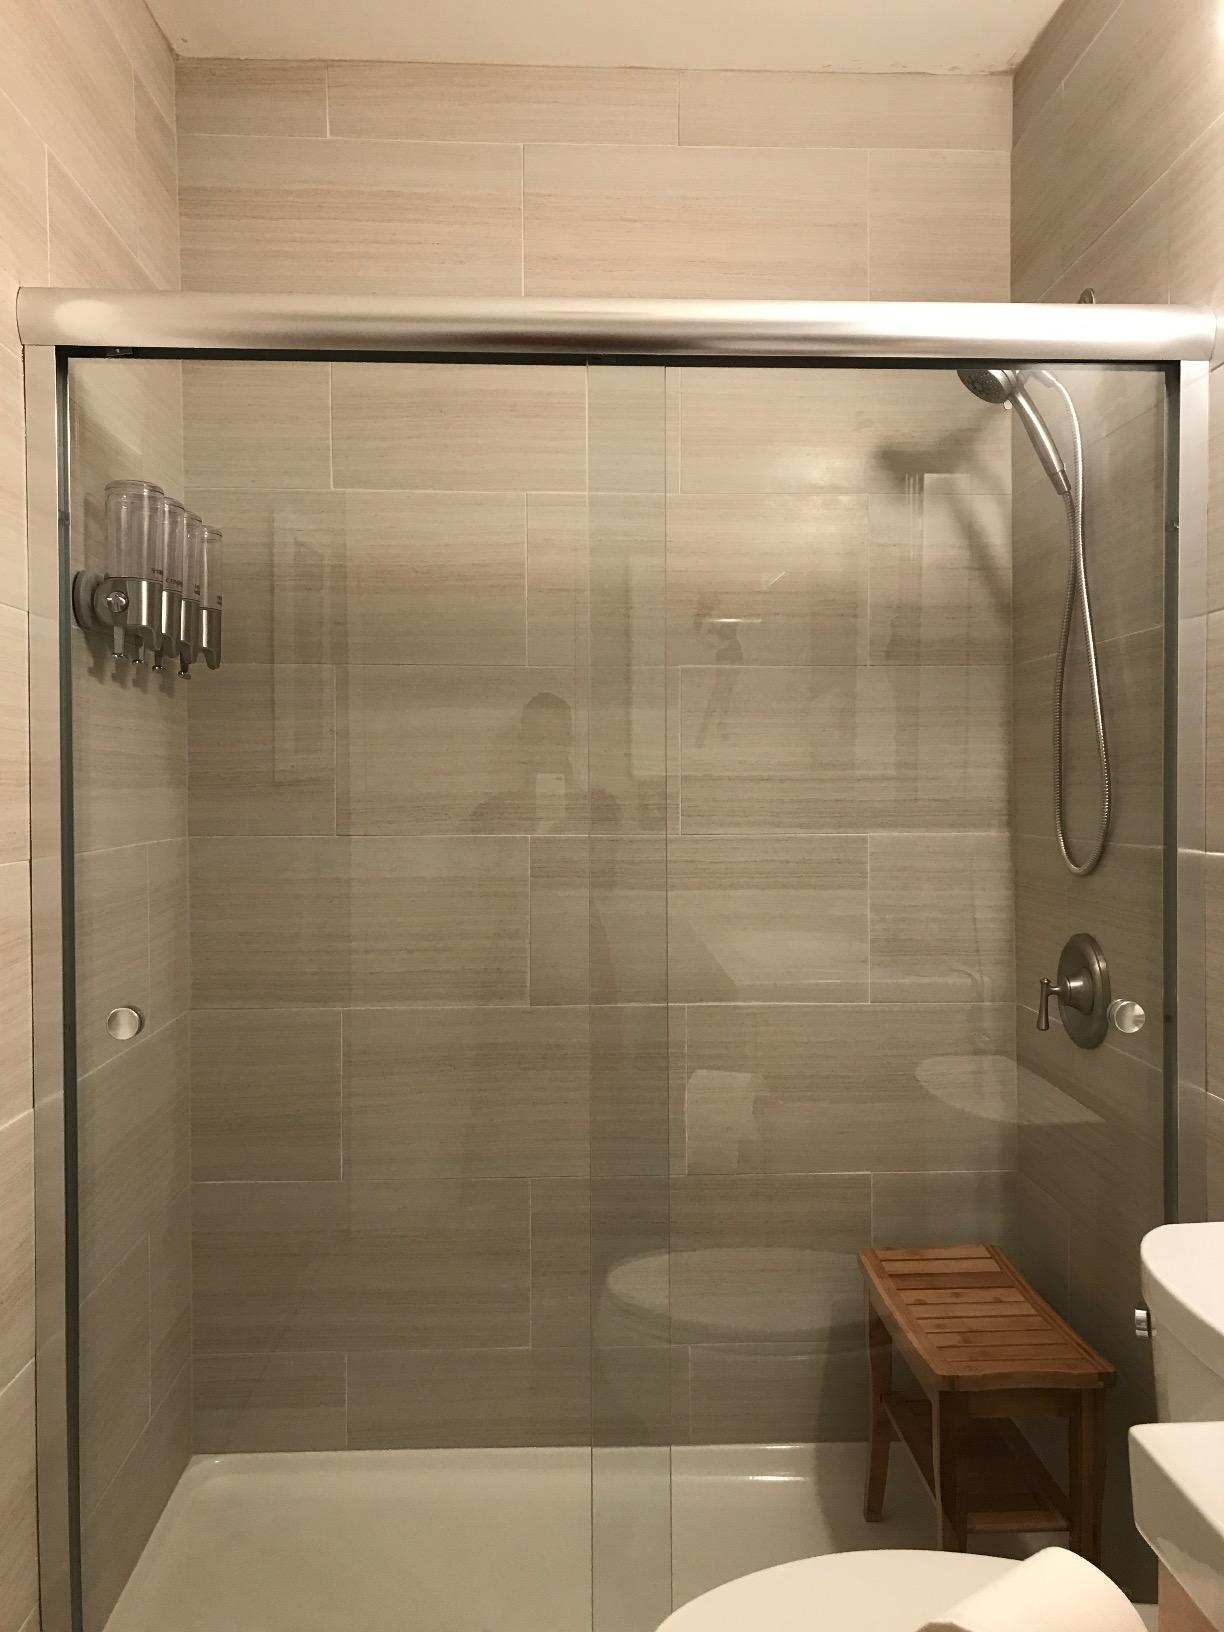 Amazonsmile Simplehuman Triple Wall Mount Shower Pump 3 X 15 Fl